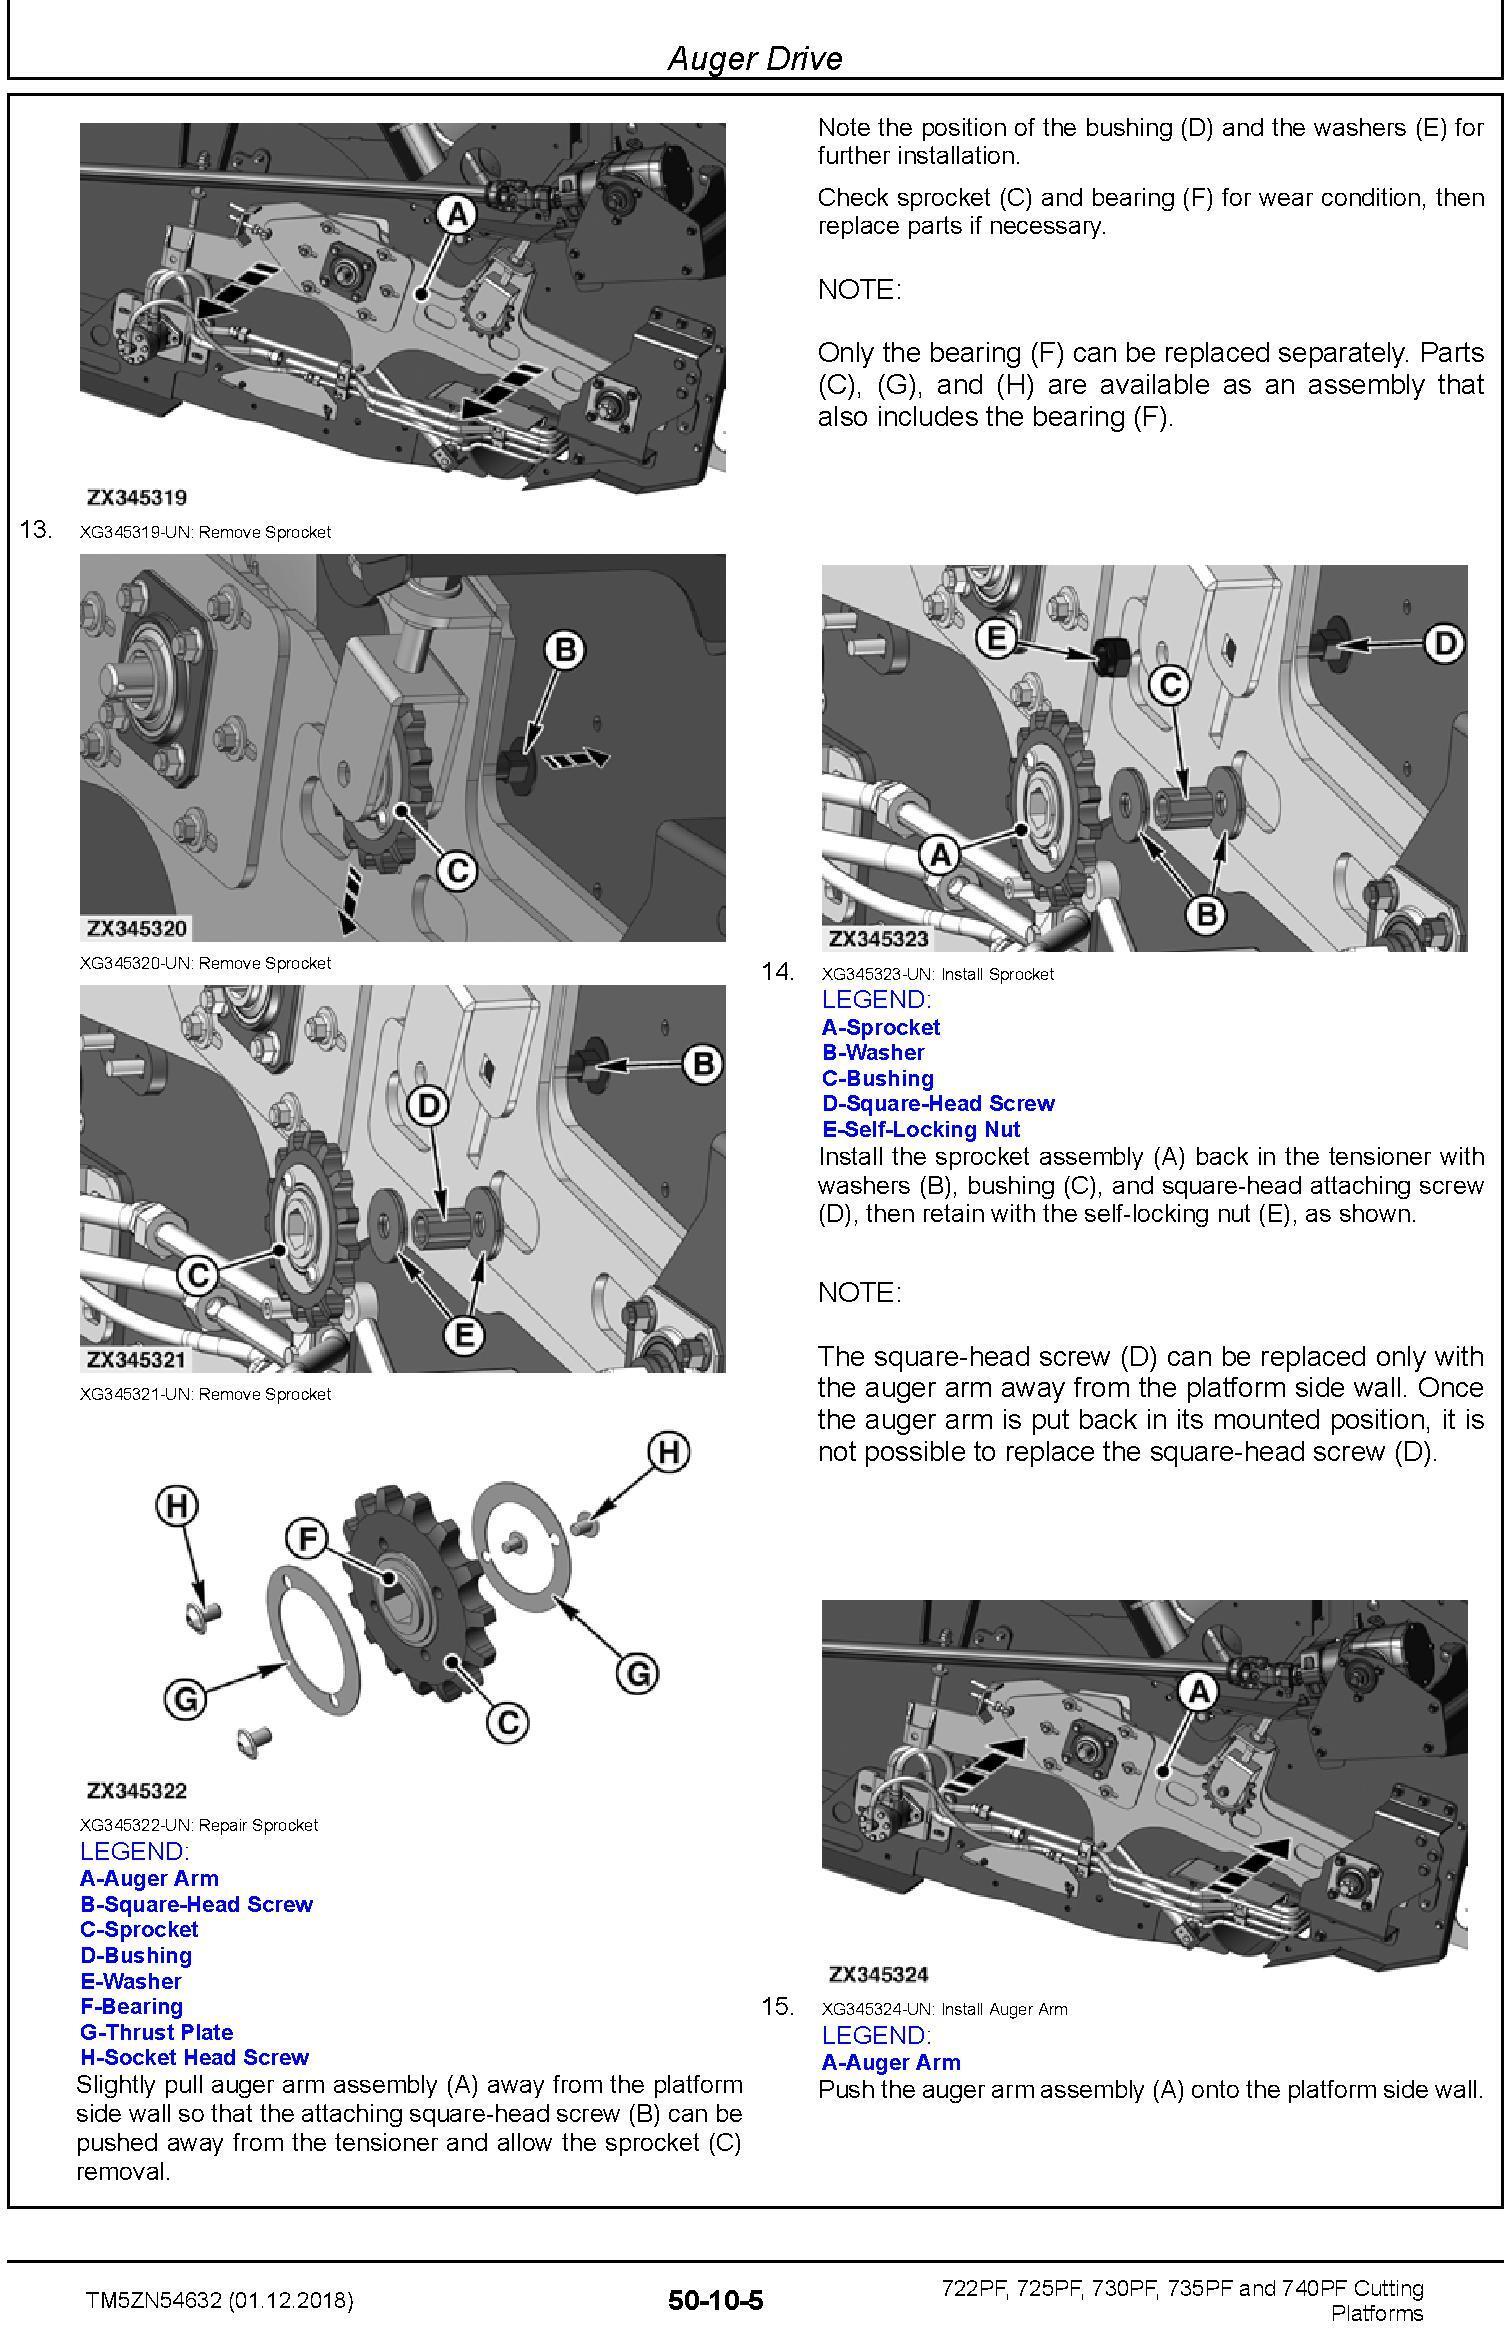 John Deere 722PF, 725PF, 730PF, 735PF and 740PF Cutting Platforms Technical Manual (TM5ZN54632) - 3